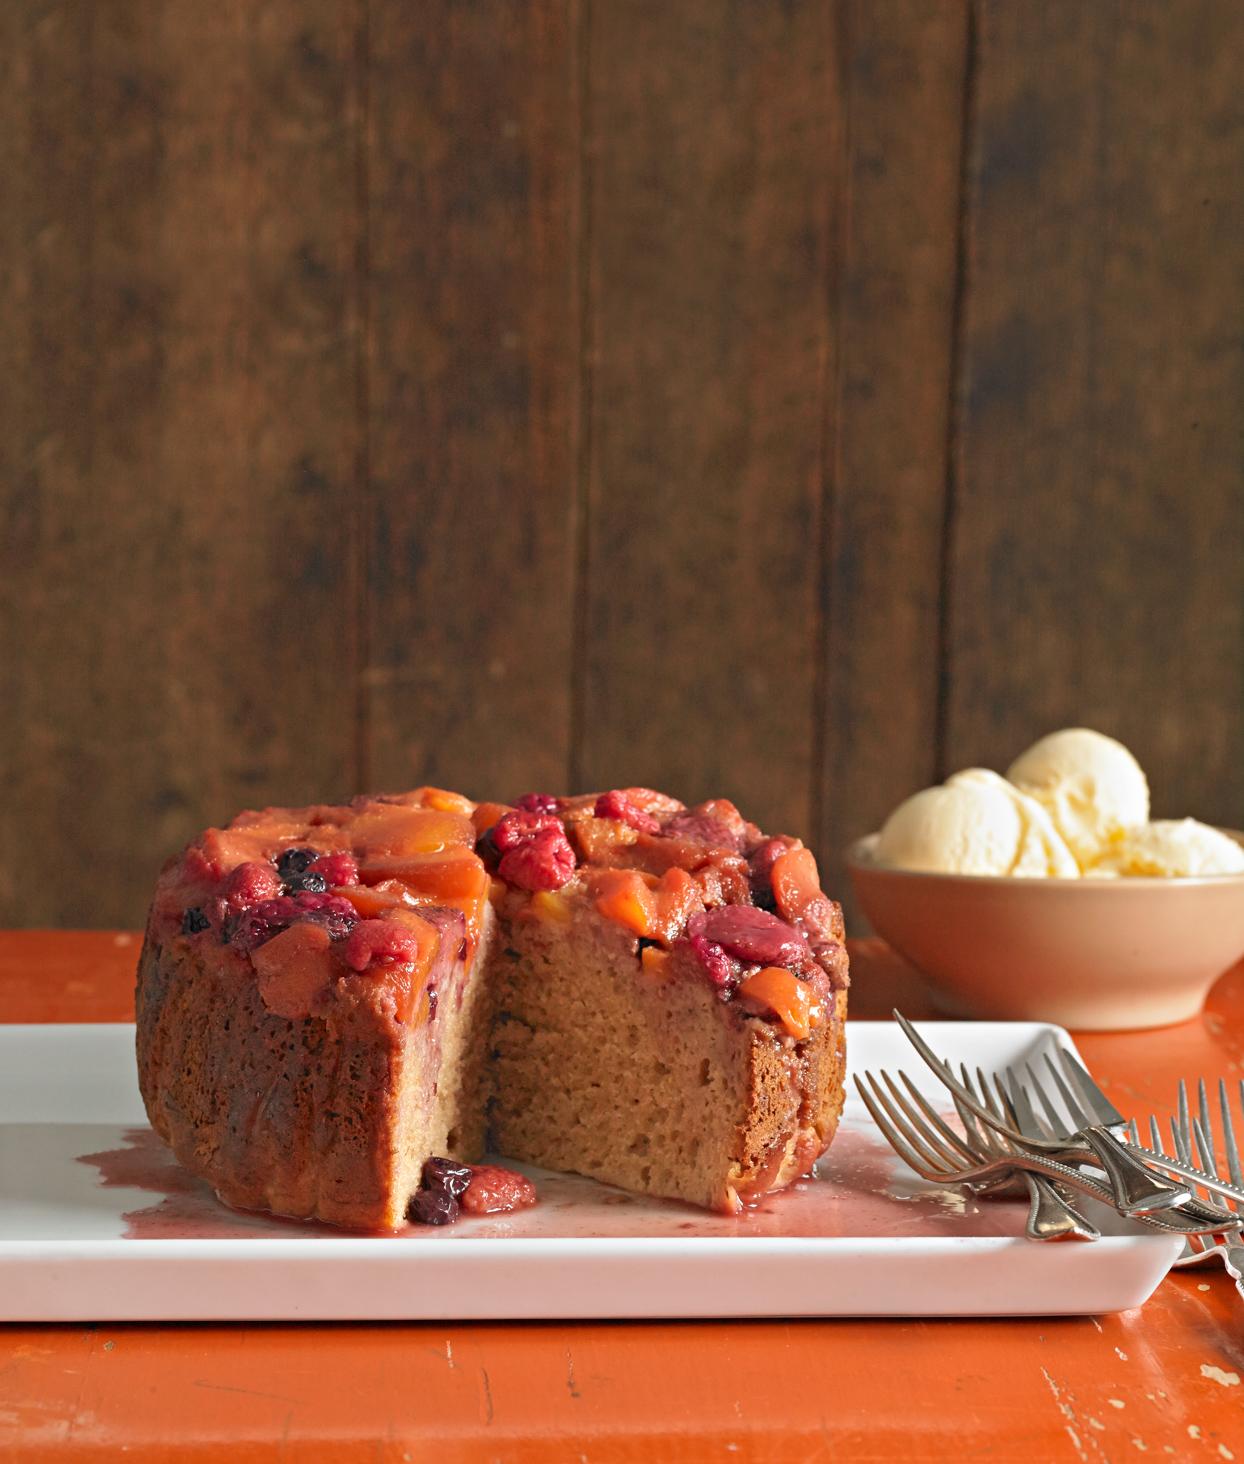 Peaches and Berries Cake